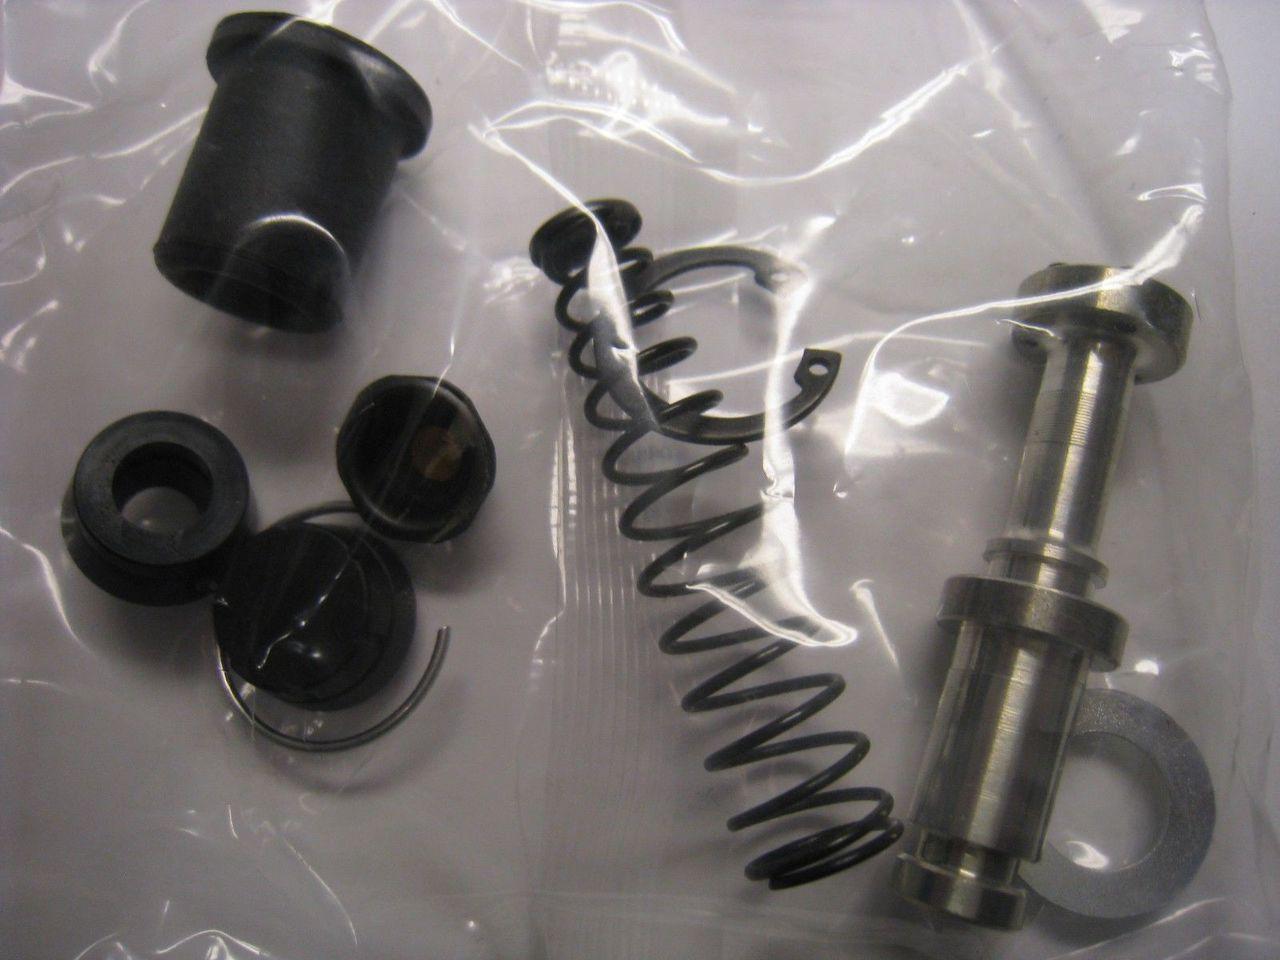 75-76 Honda CB550 CB550K CB550F Master Cylinder Rebuild Kit # 32-1101